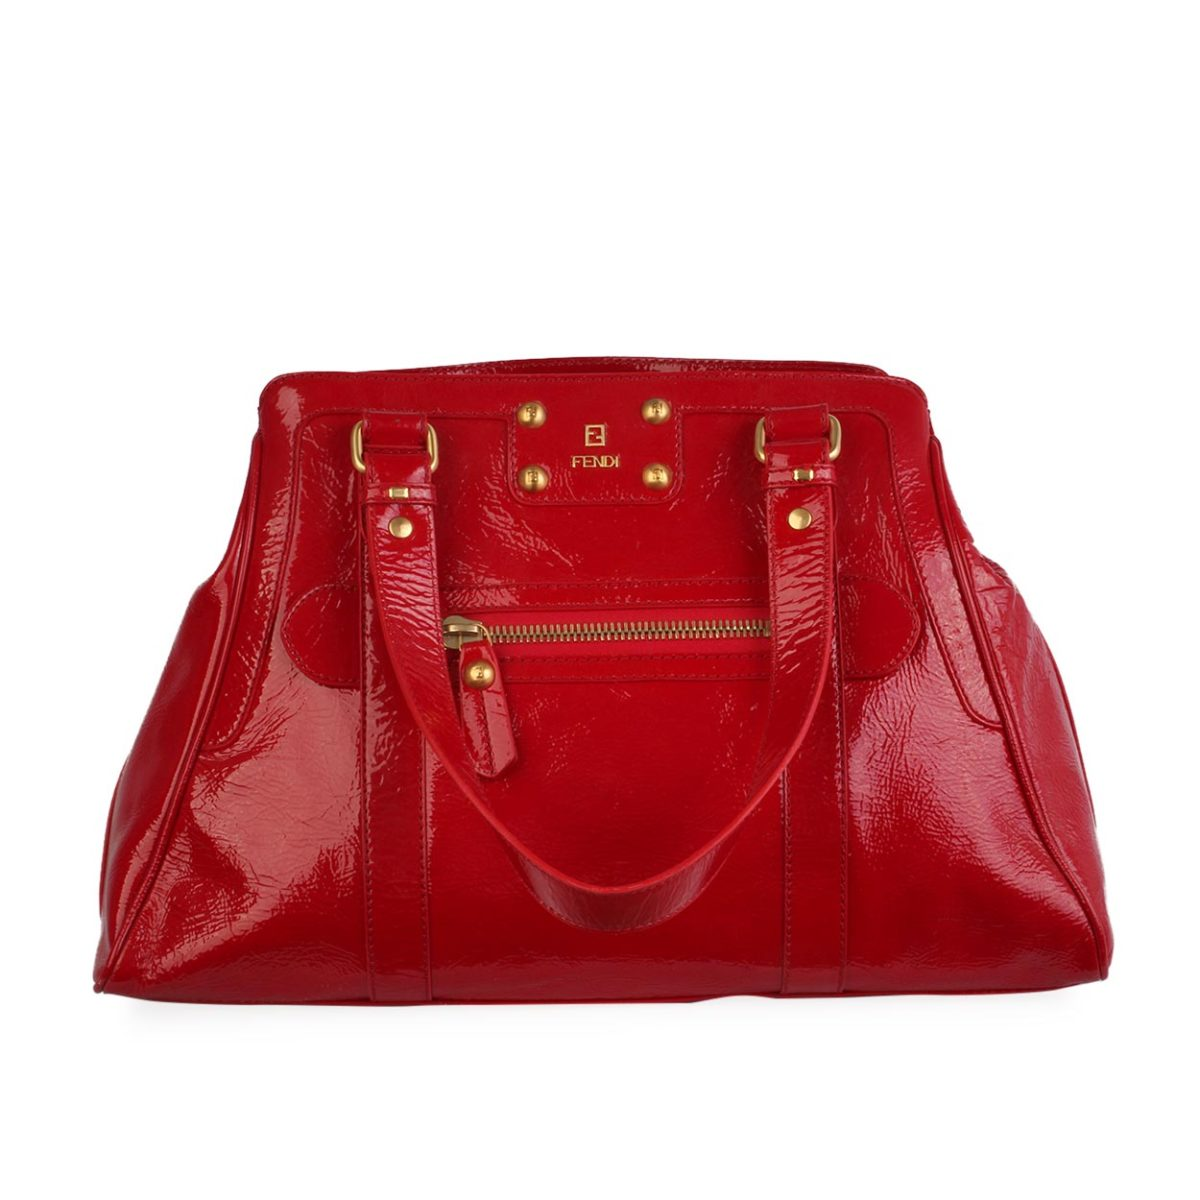 487830545c05 FENDI Patent Bag Du Jour Red - NEW